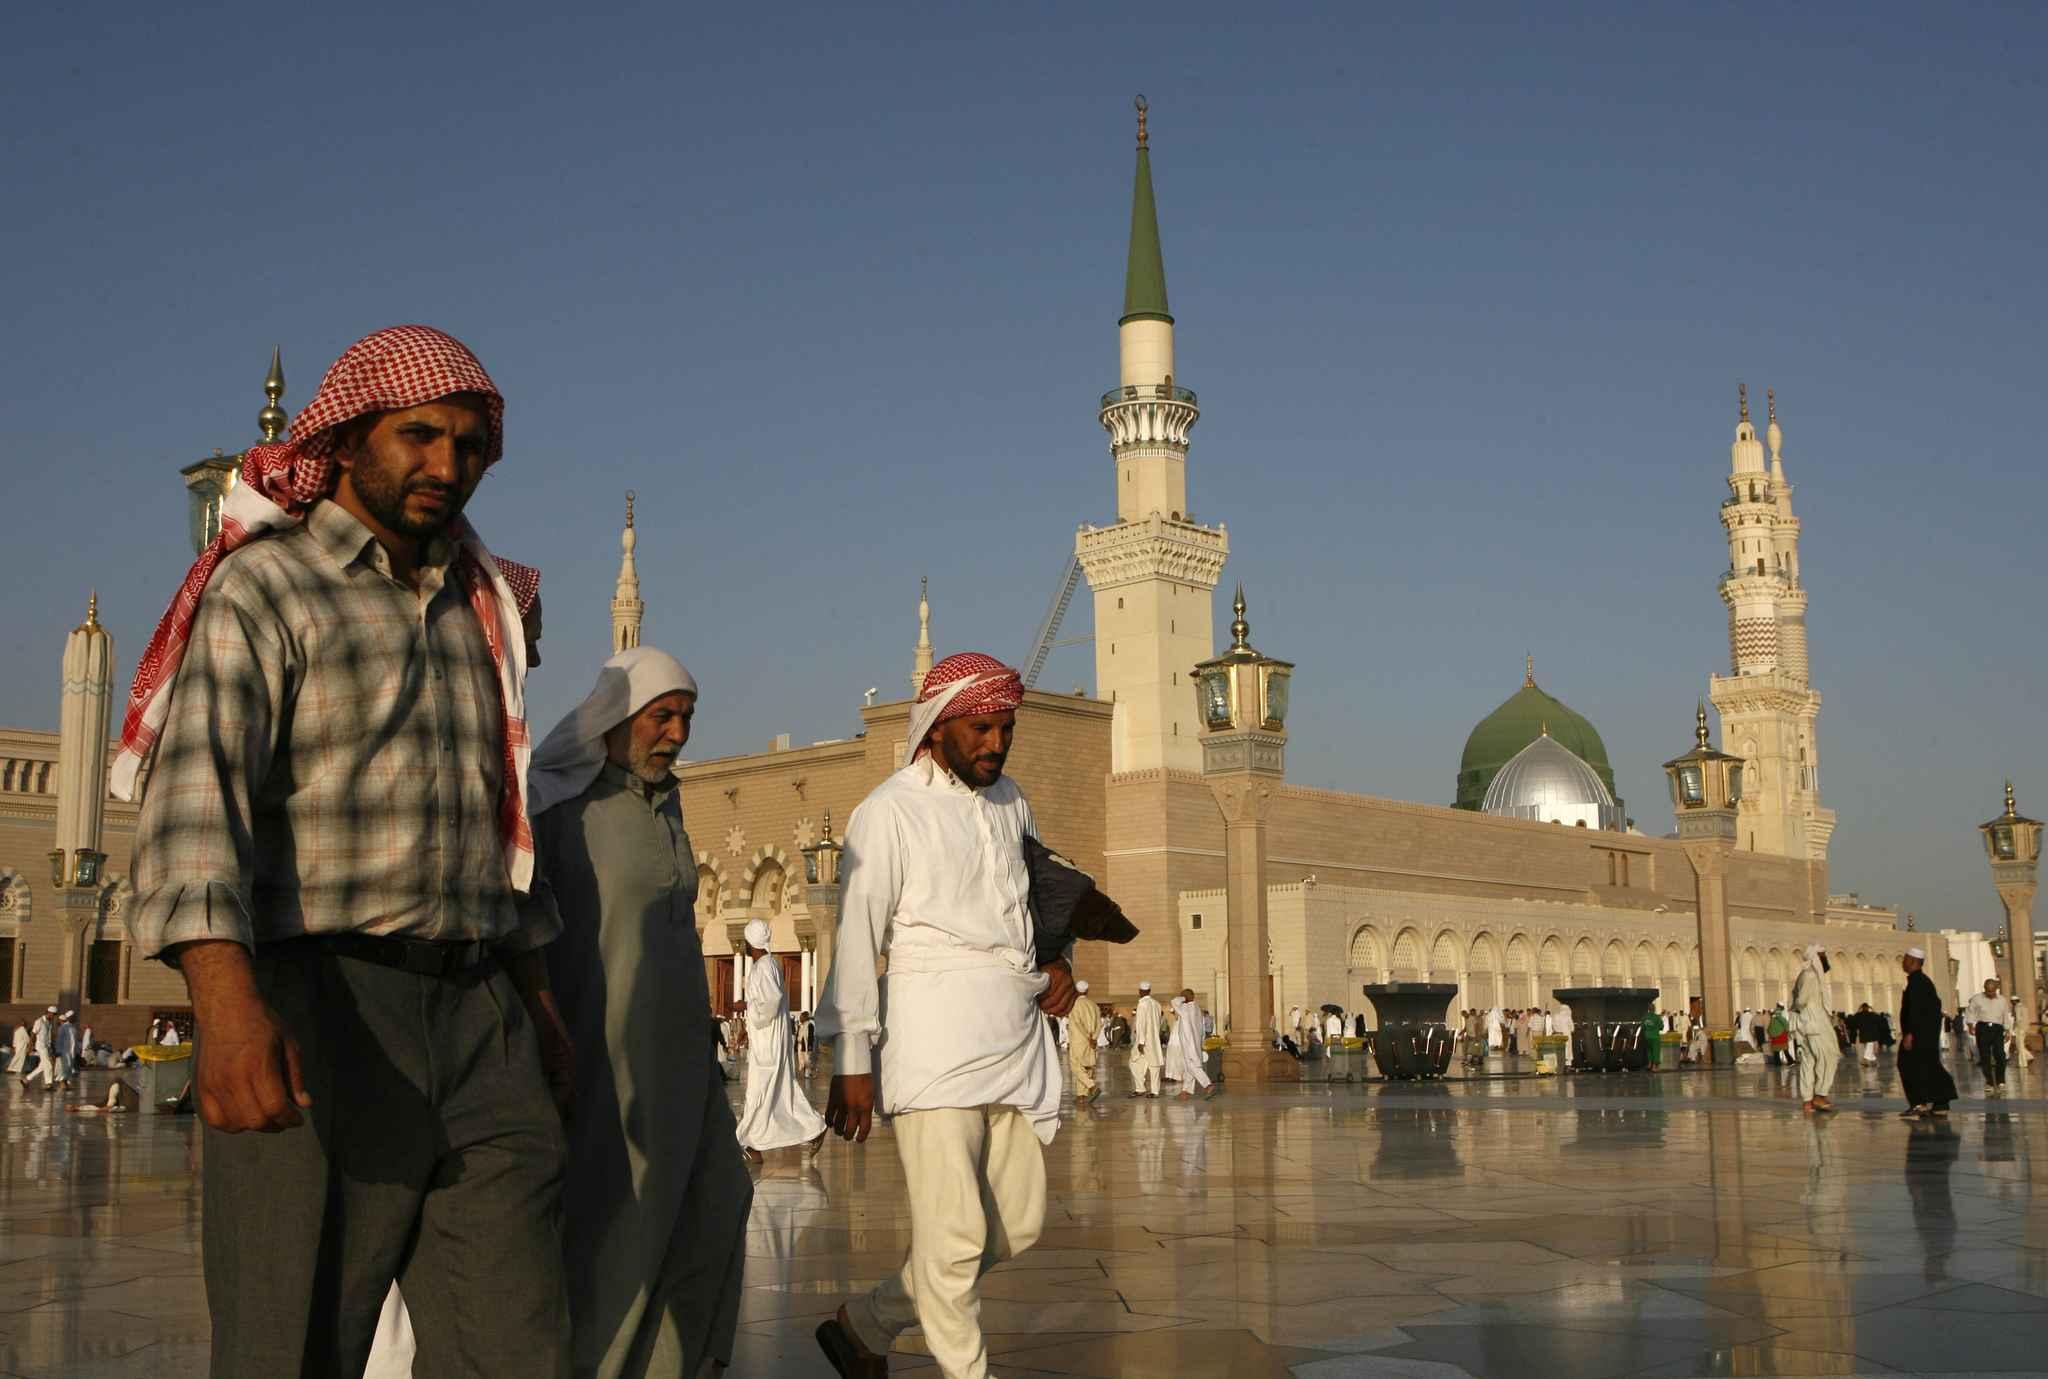 arabie-saoudite-desciption-paysage